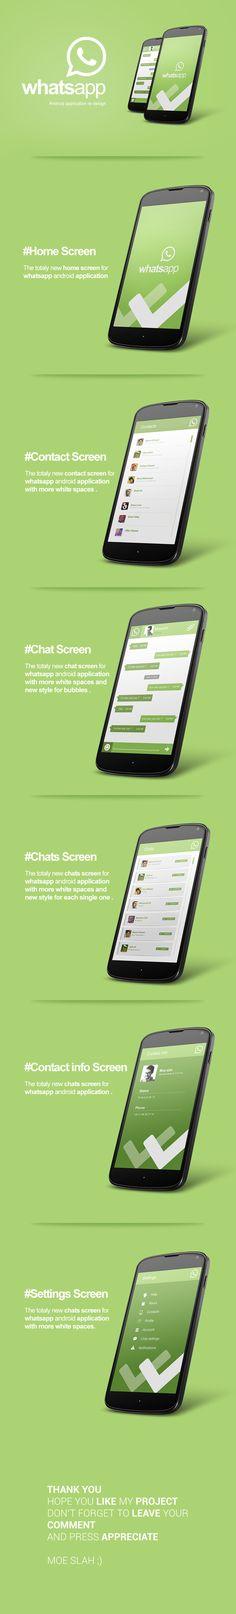 Whatsapp Android App Re-design by Moe slah, via Behance